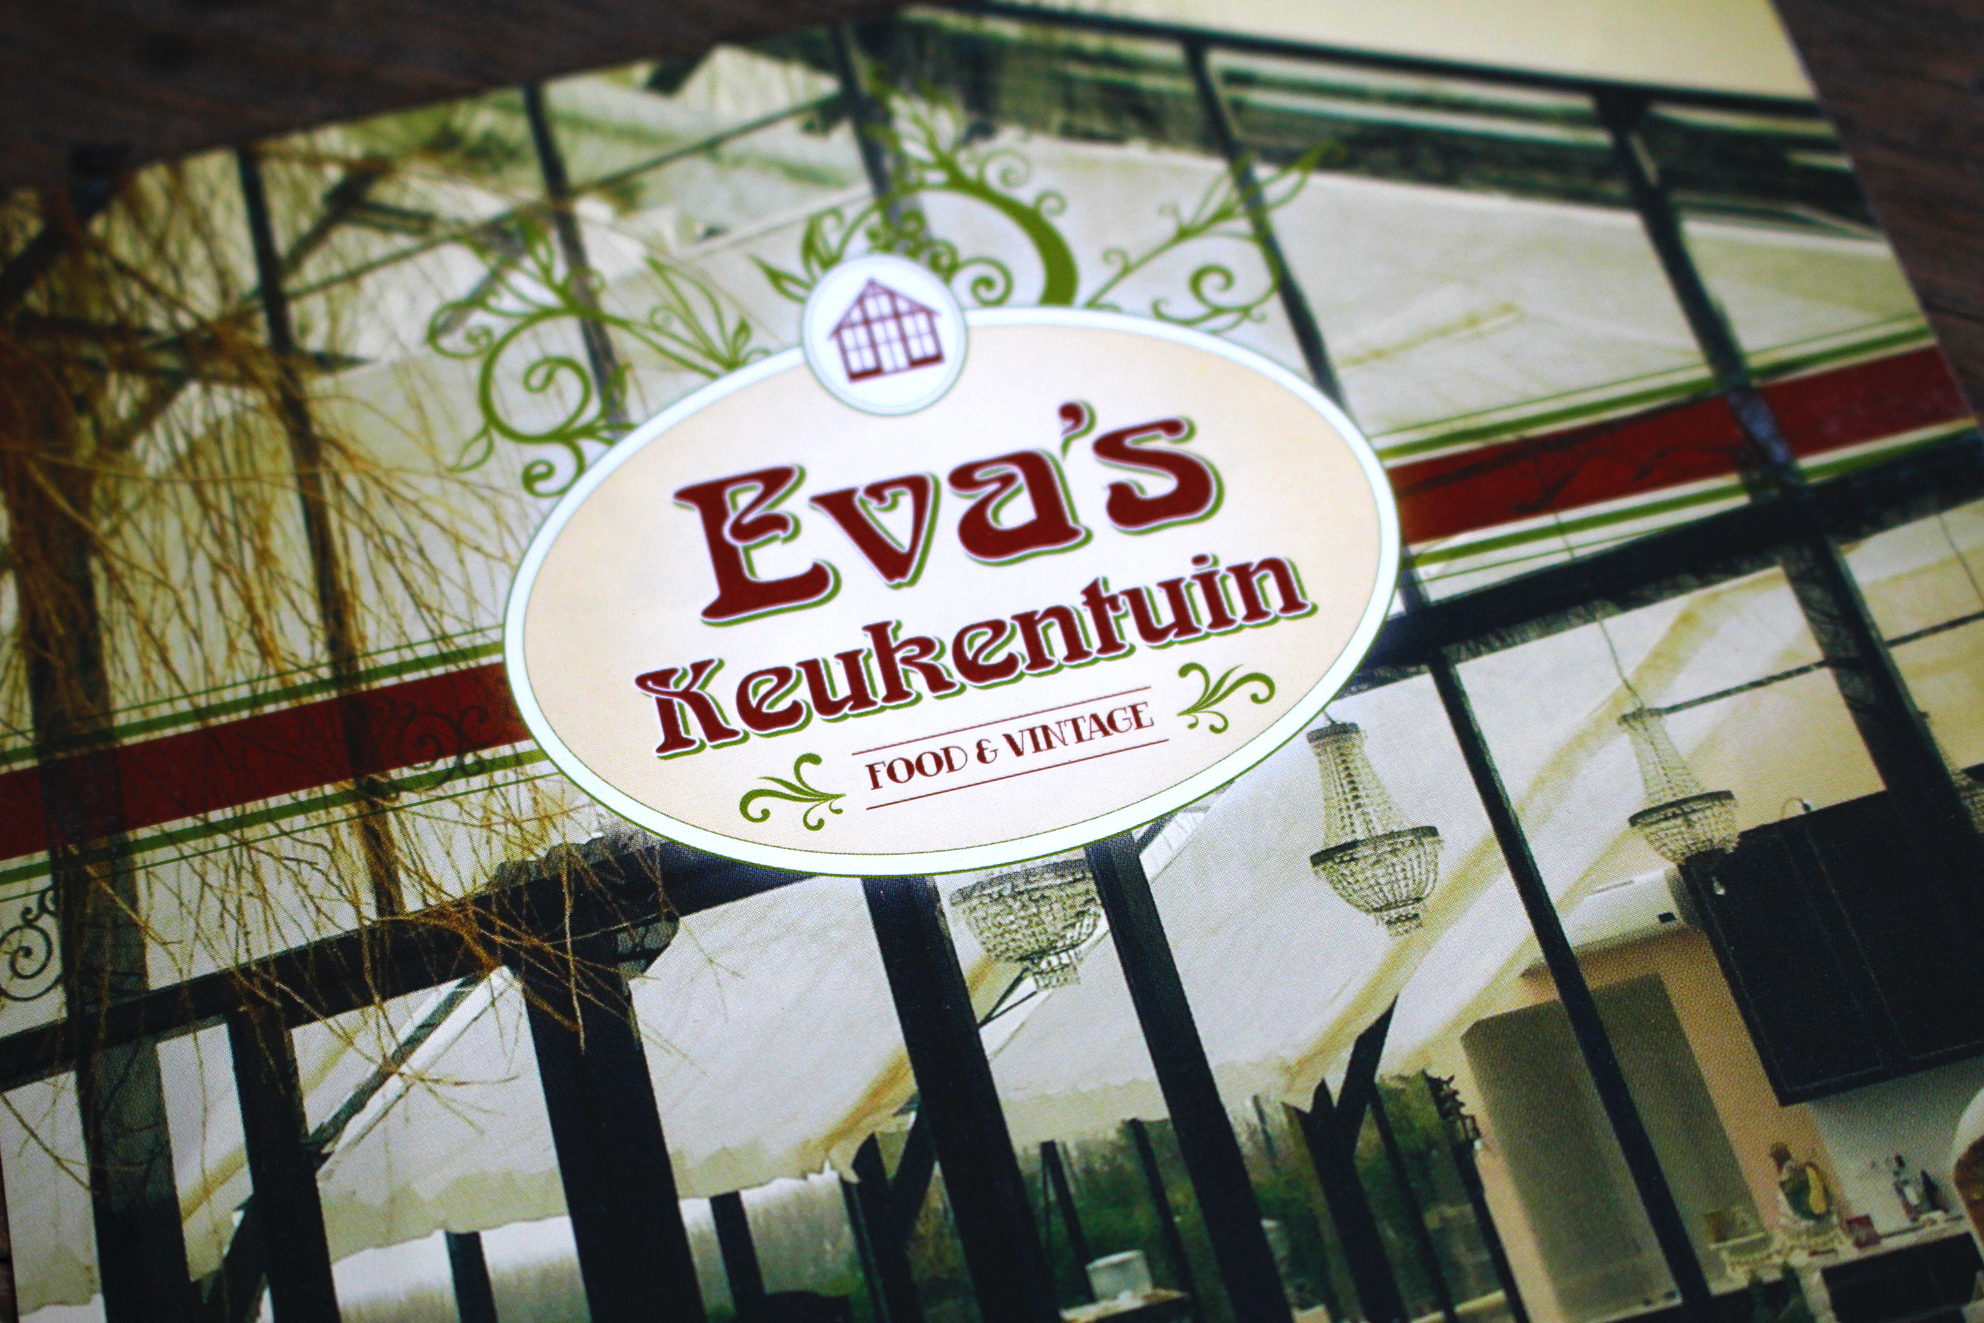 Eva's Keukentuin